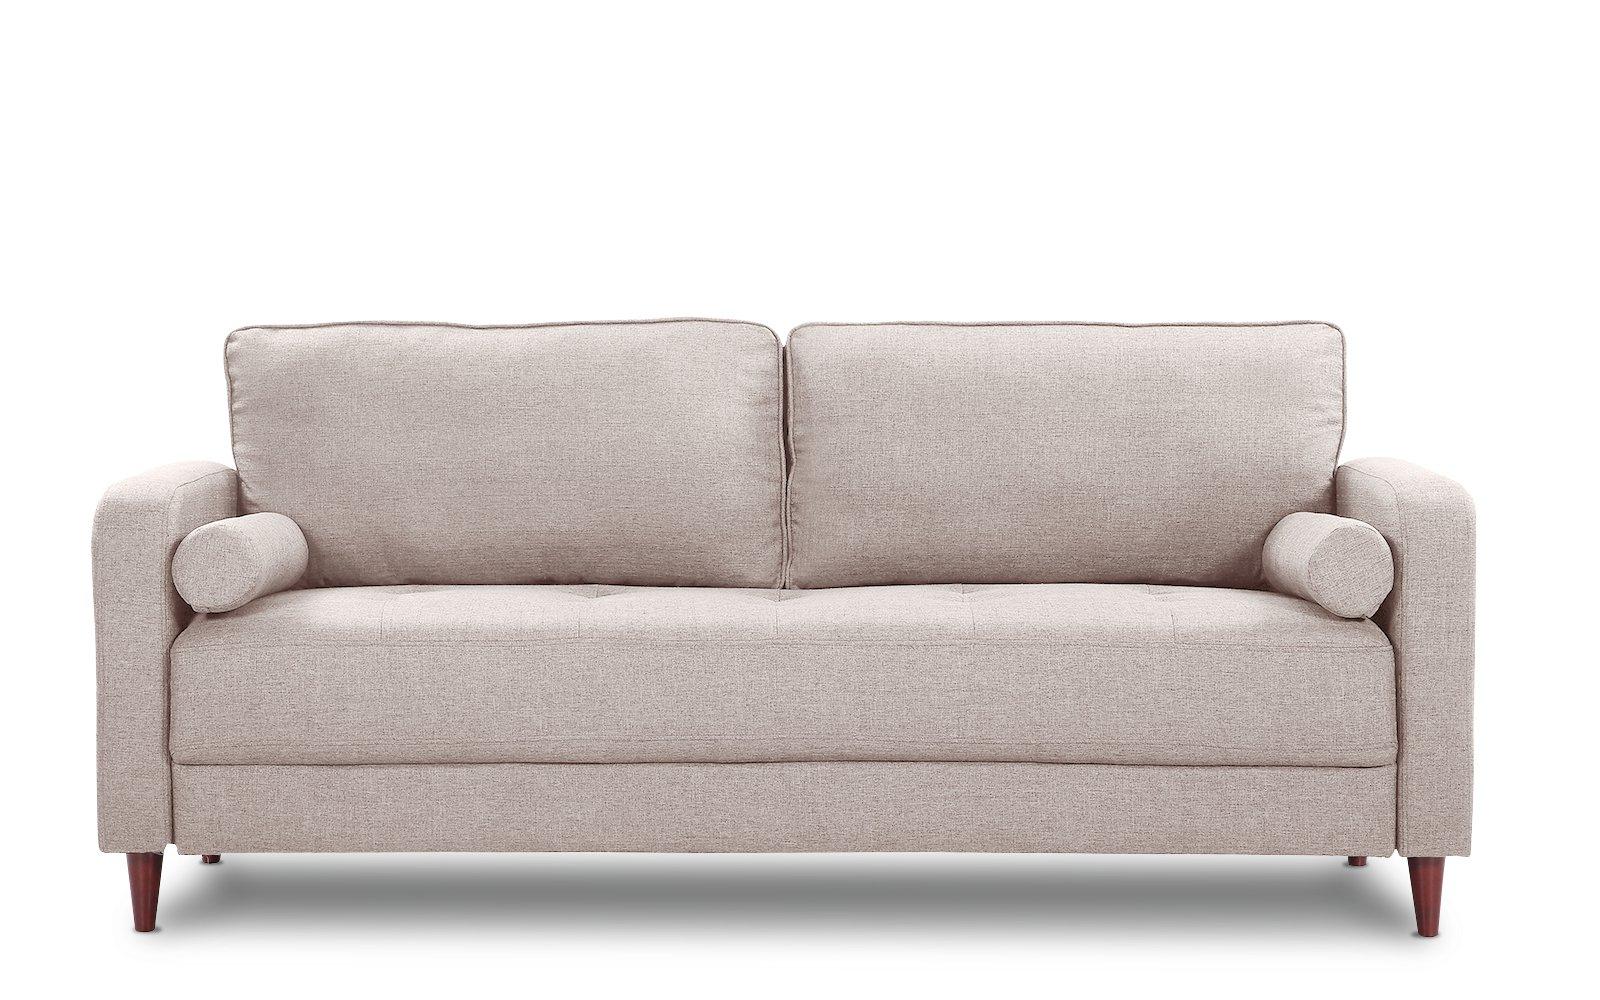 Sofas En Lugo E6d5 Lugo Classic Mid Century Modern Linen sofa sofamania